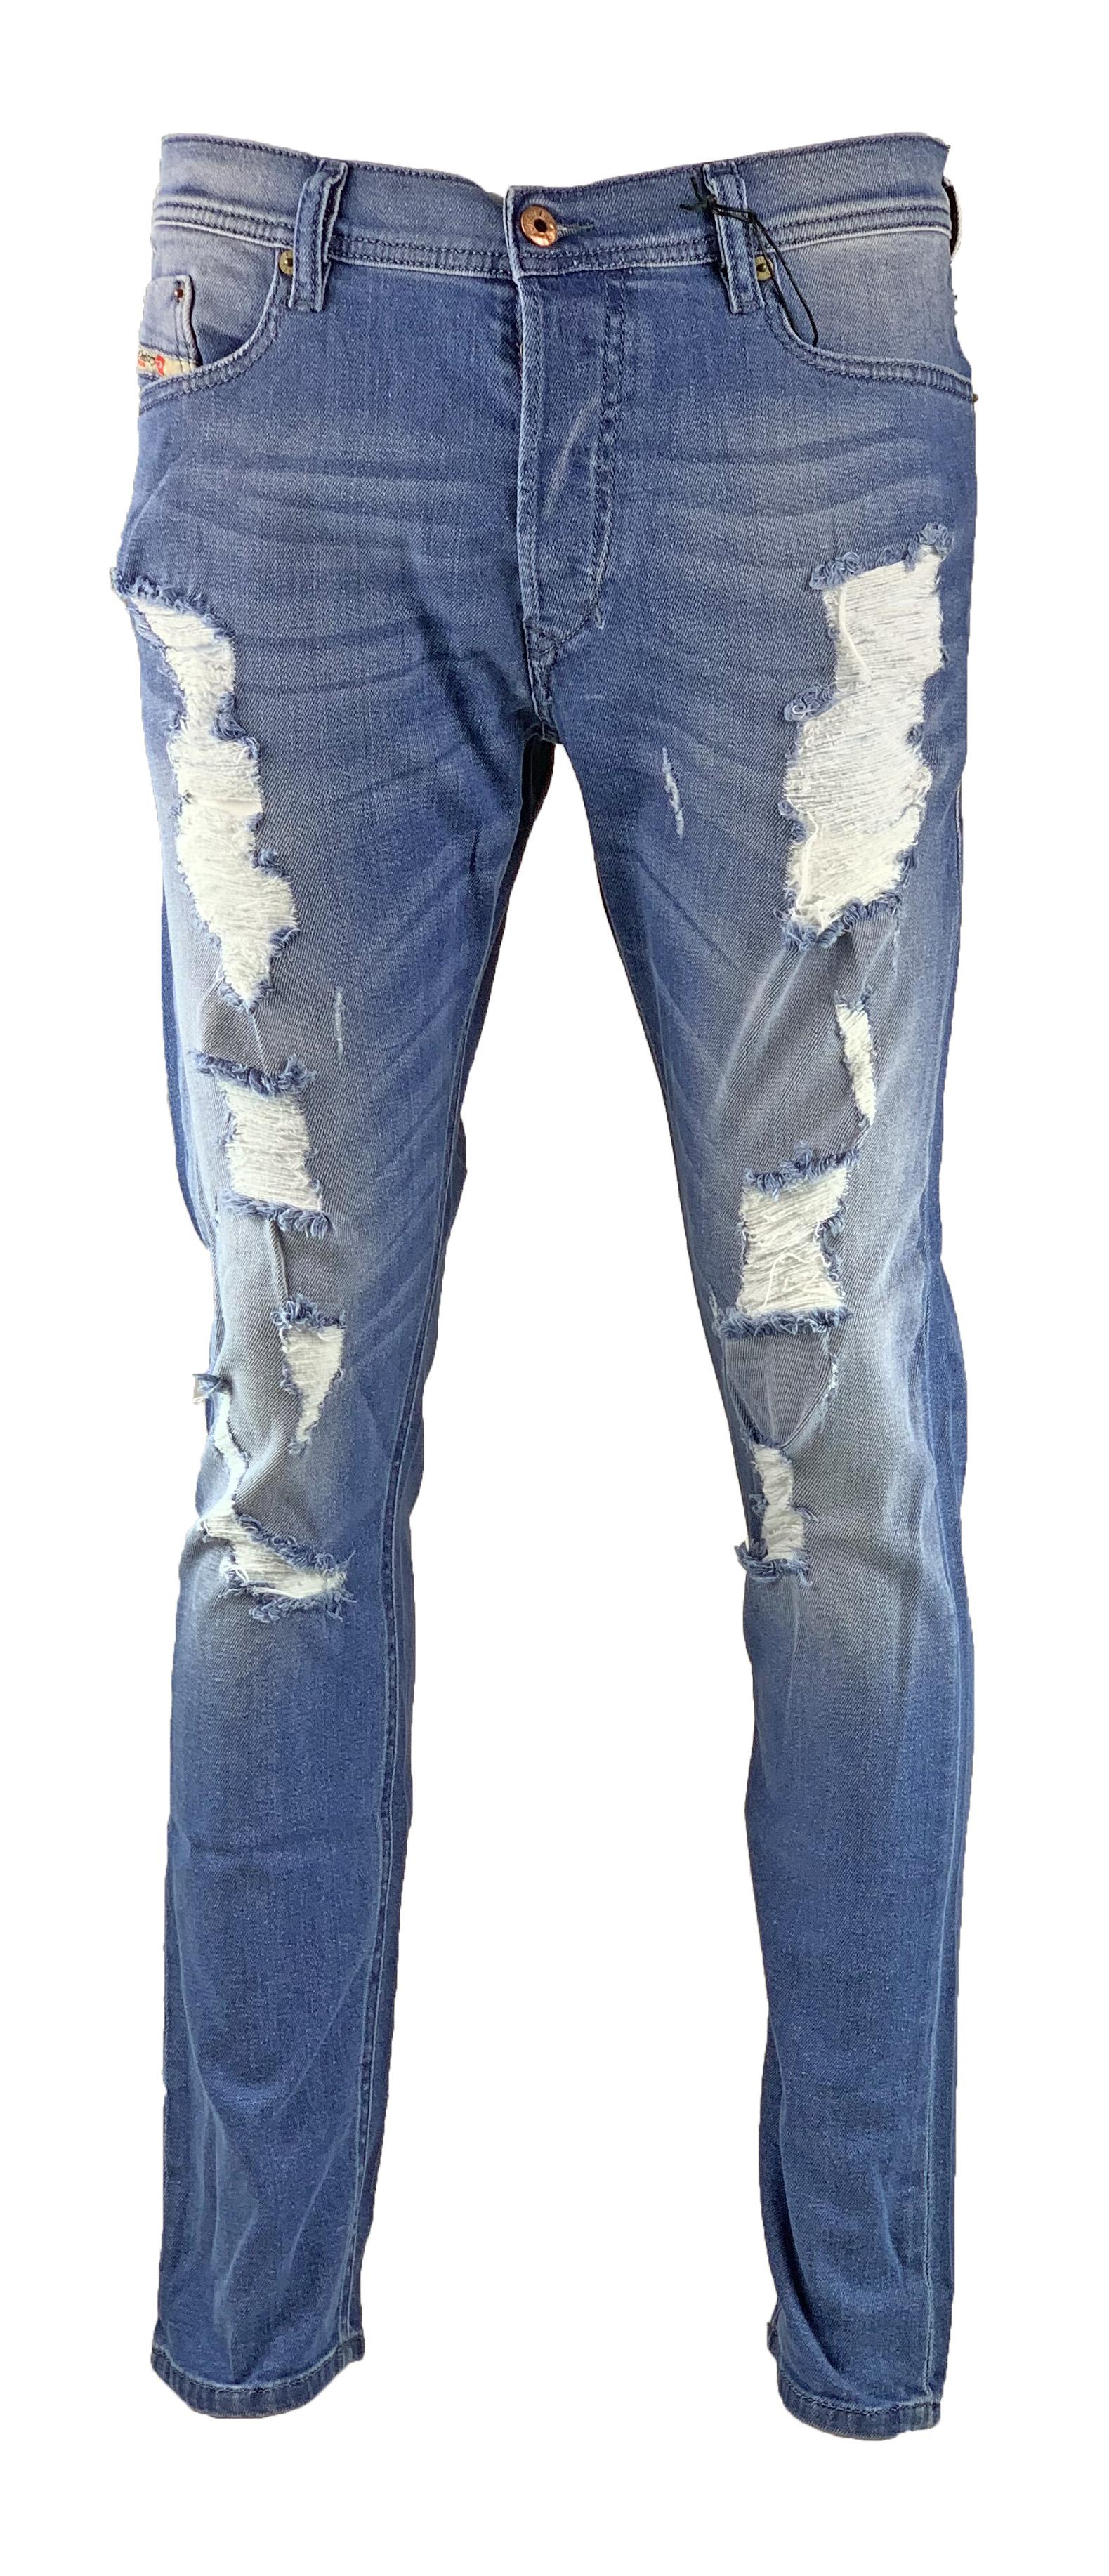 dee611f1 Diesel Tepphar 0669Y Jeans | eBay